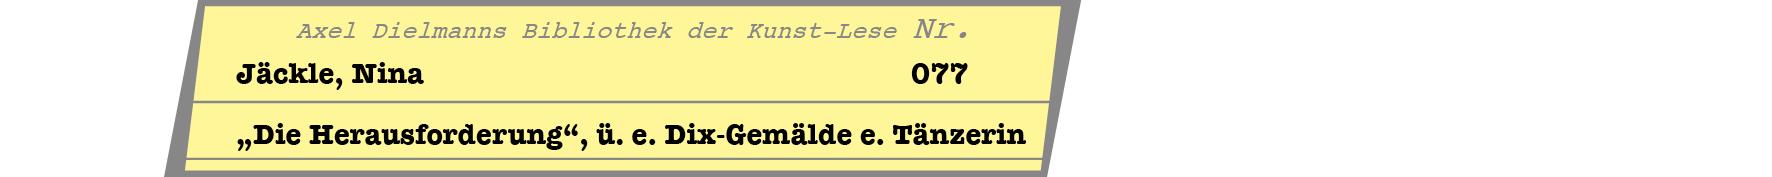 Kartei-72